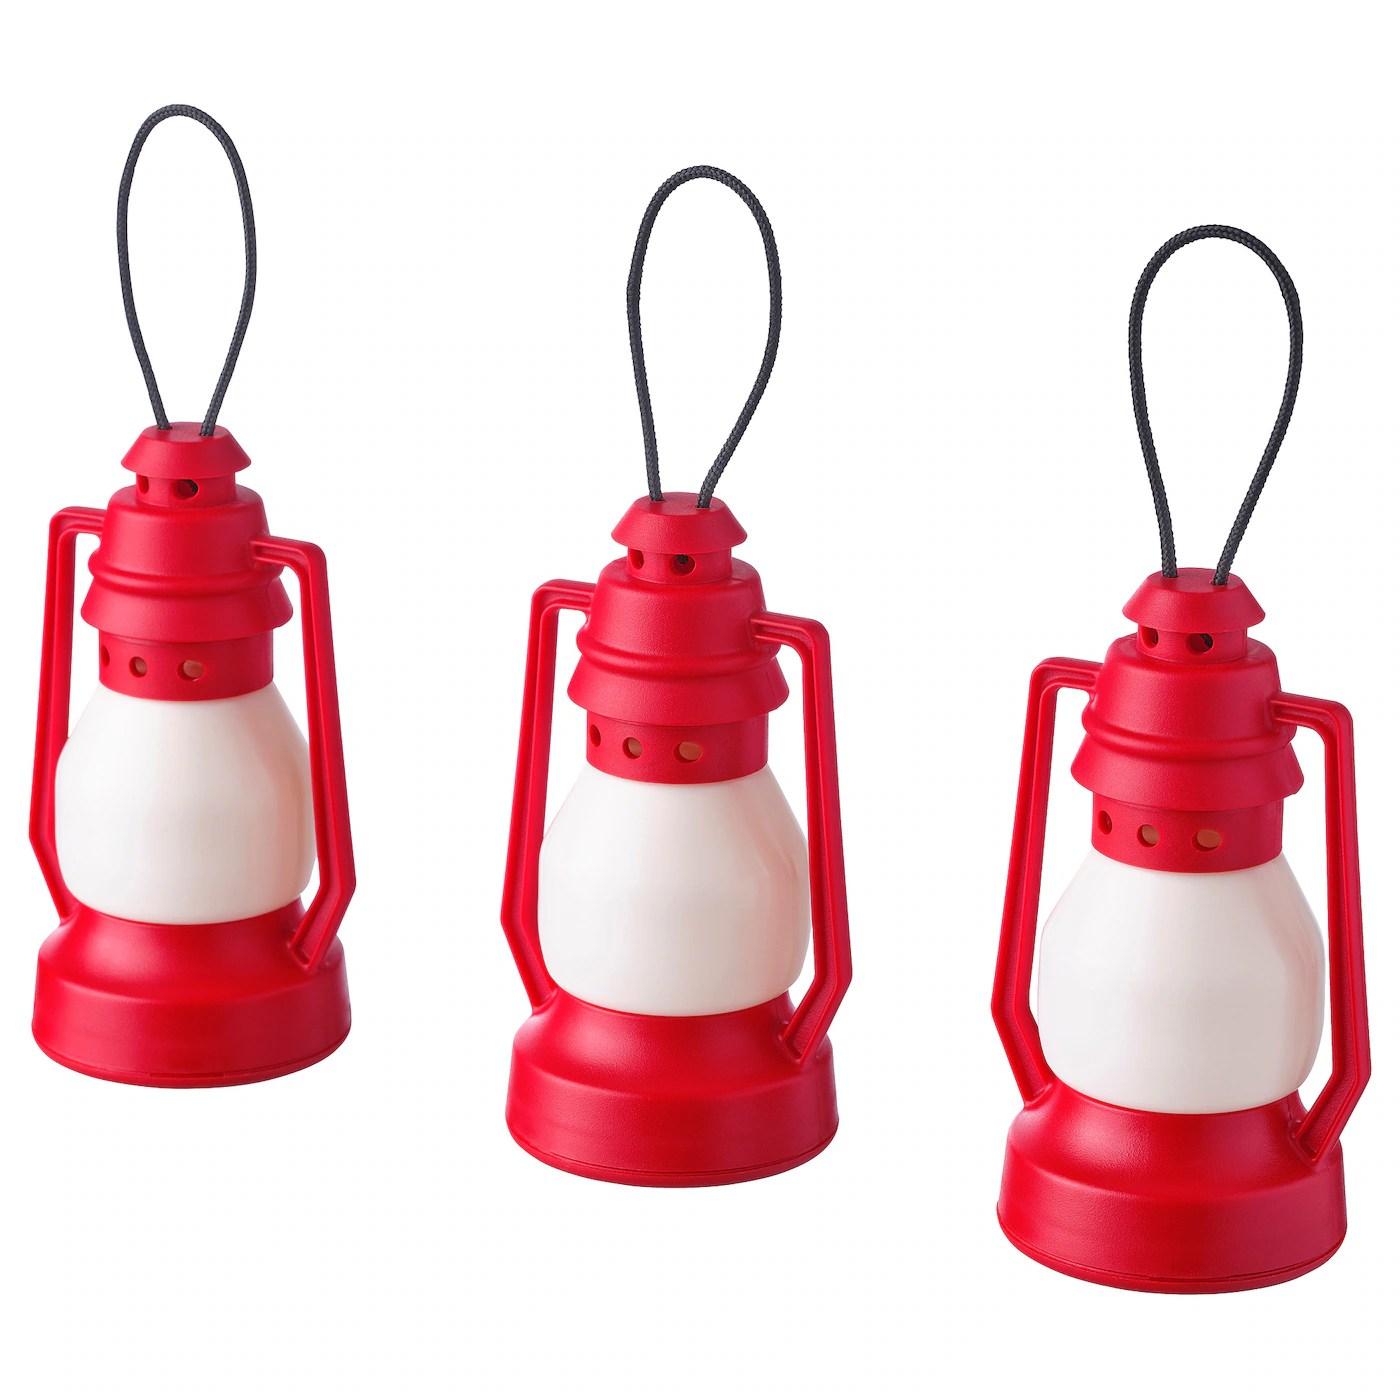 Led Decorative Light Vinterfest Battery Operated Lantern Red